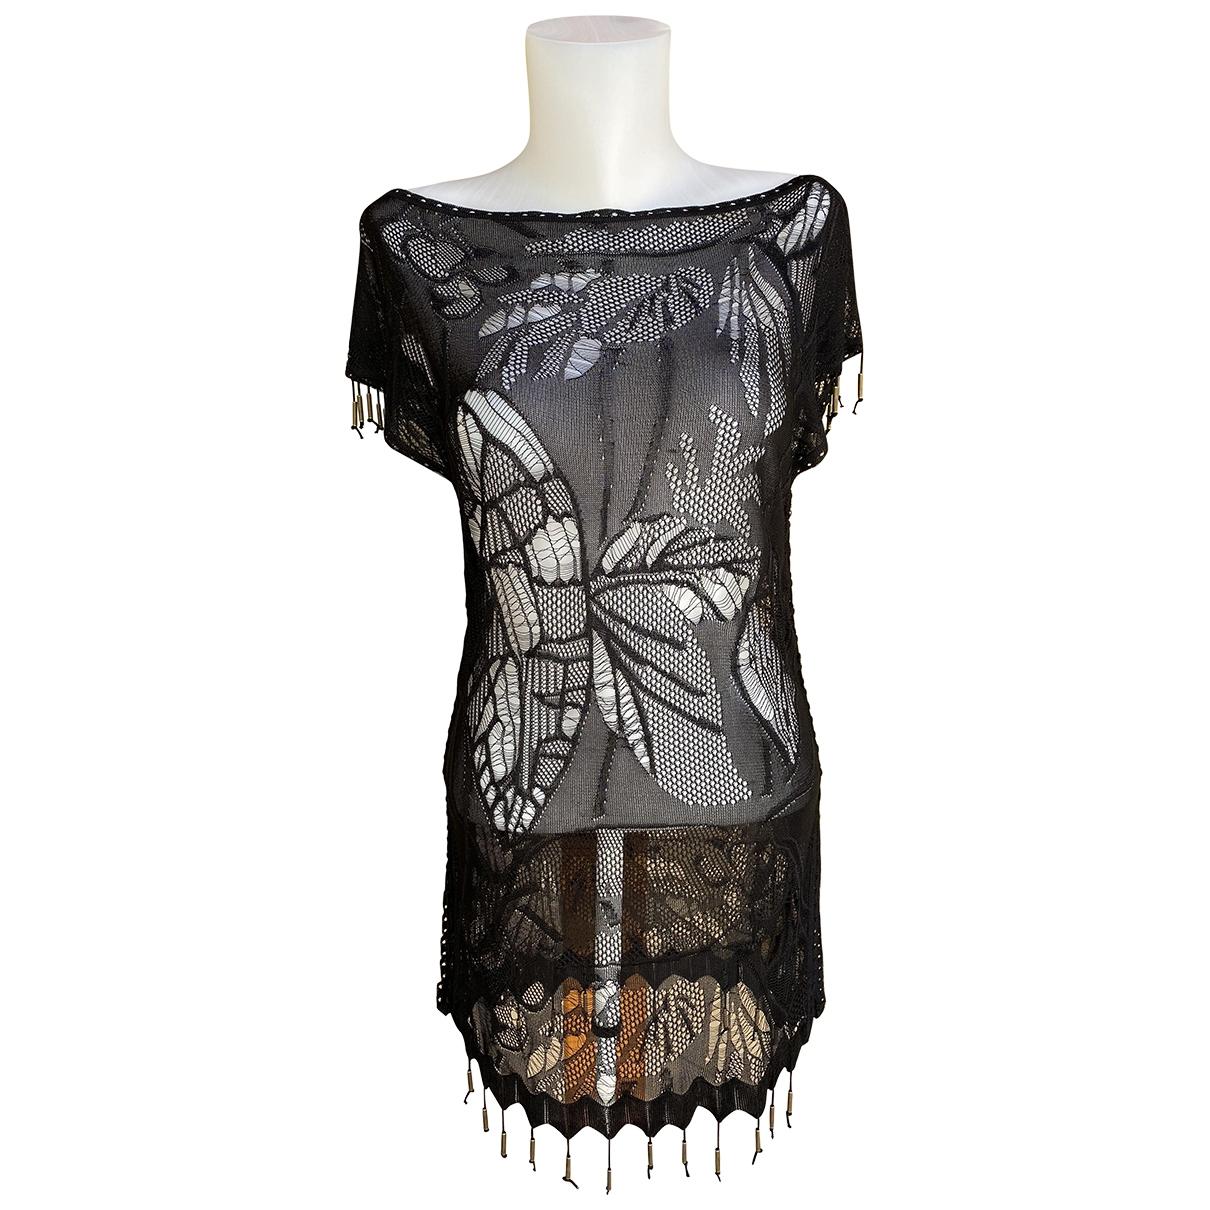 Givenchy \N Top in  Schwarz Viskose